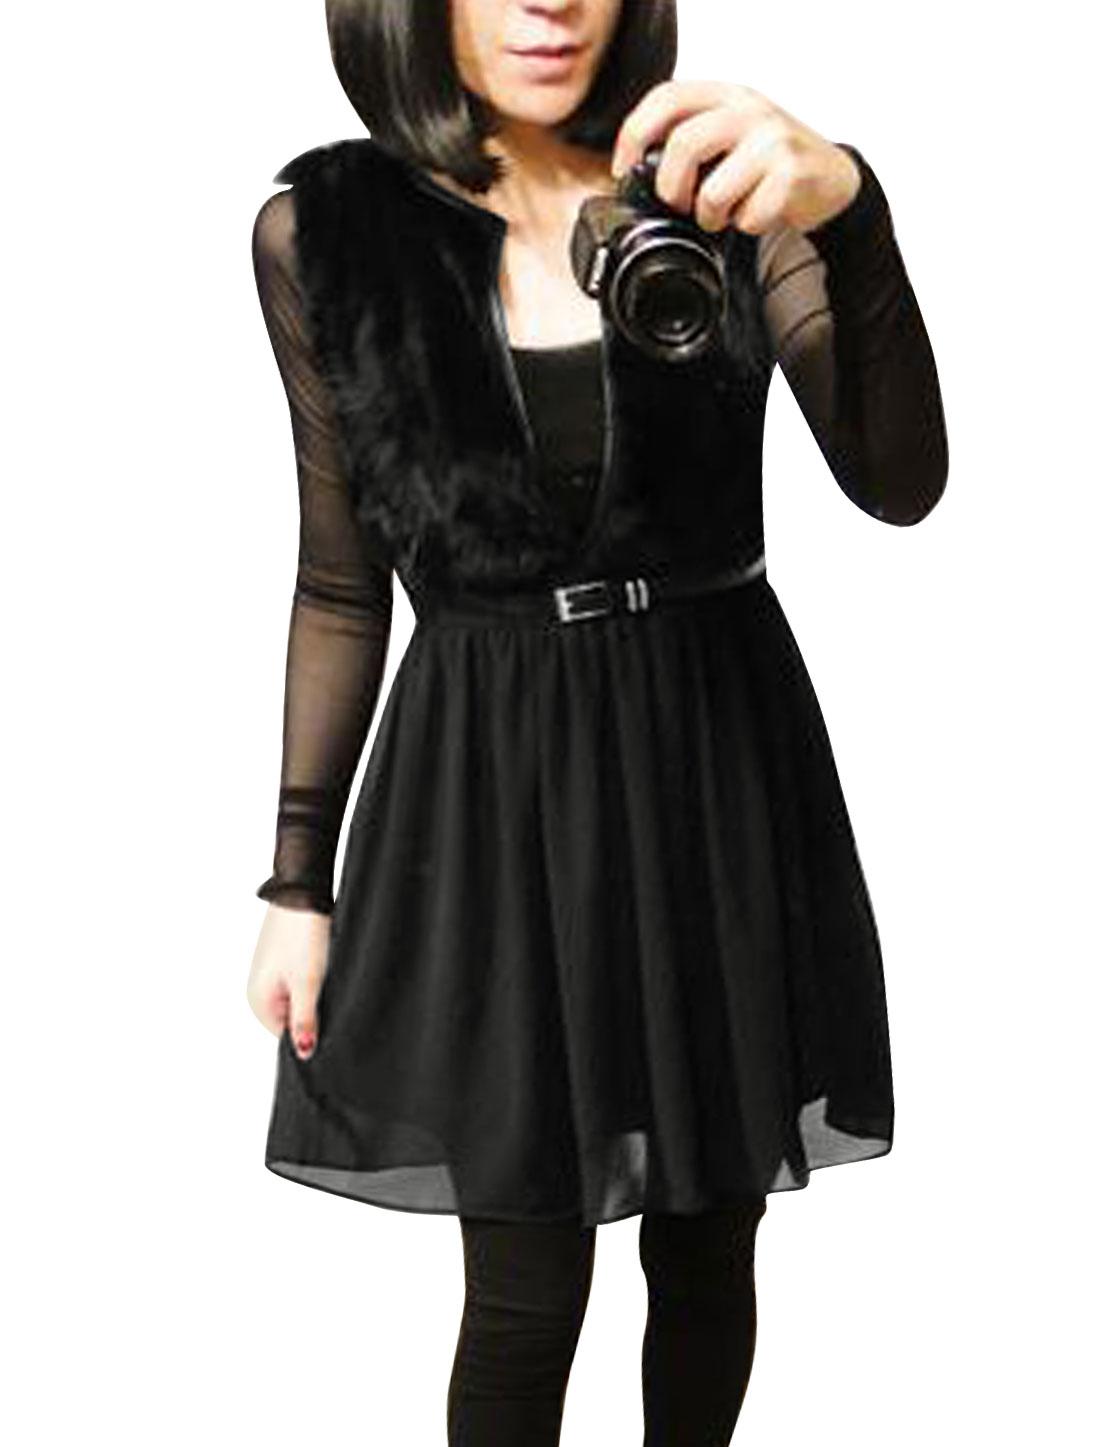 Lady Long Sleeves Mesh Top w Faux Fur Decor Stretch Waist Tank Top Black XS